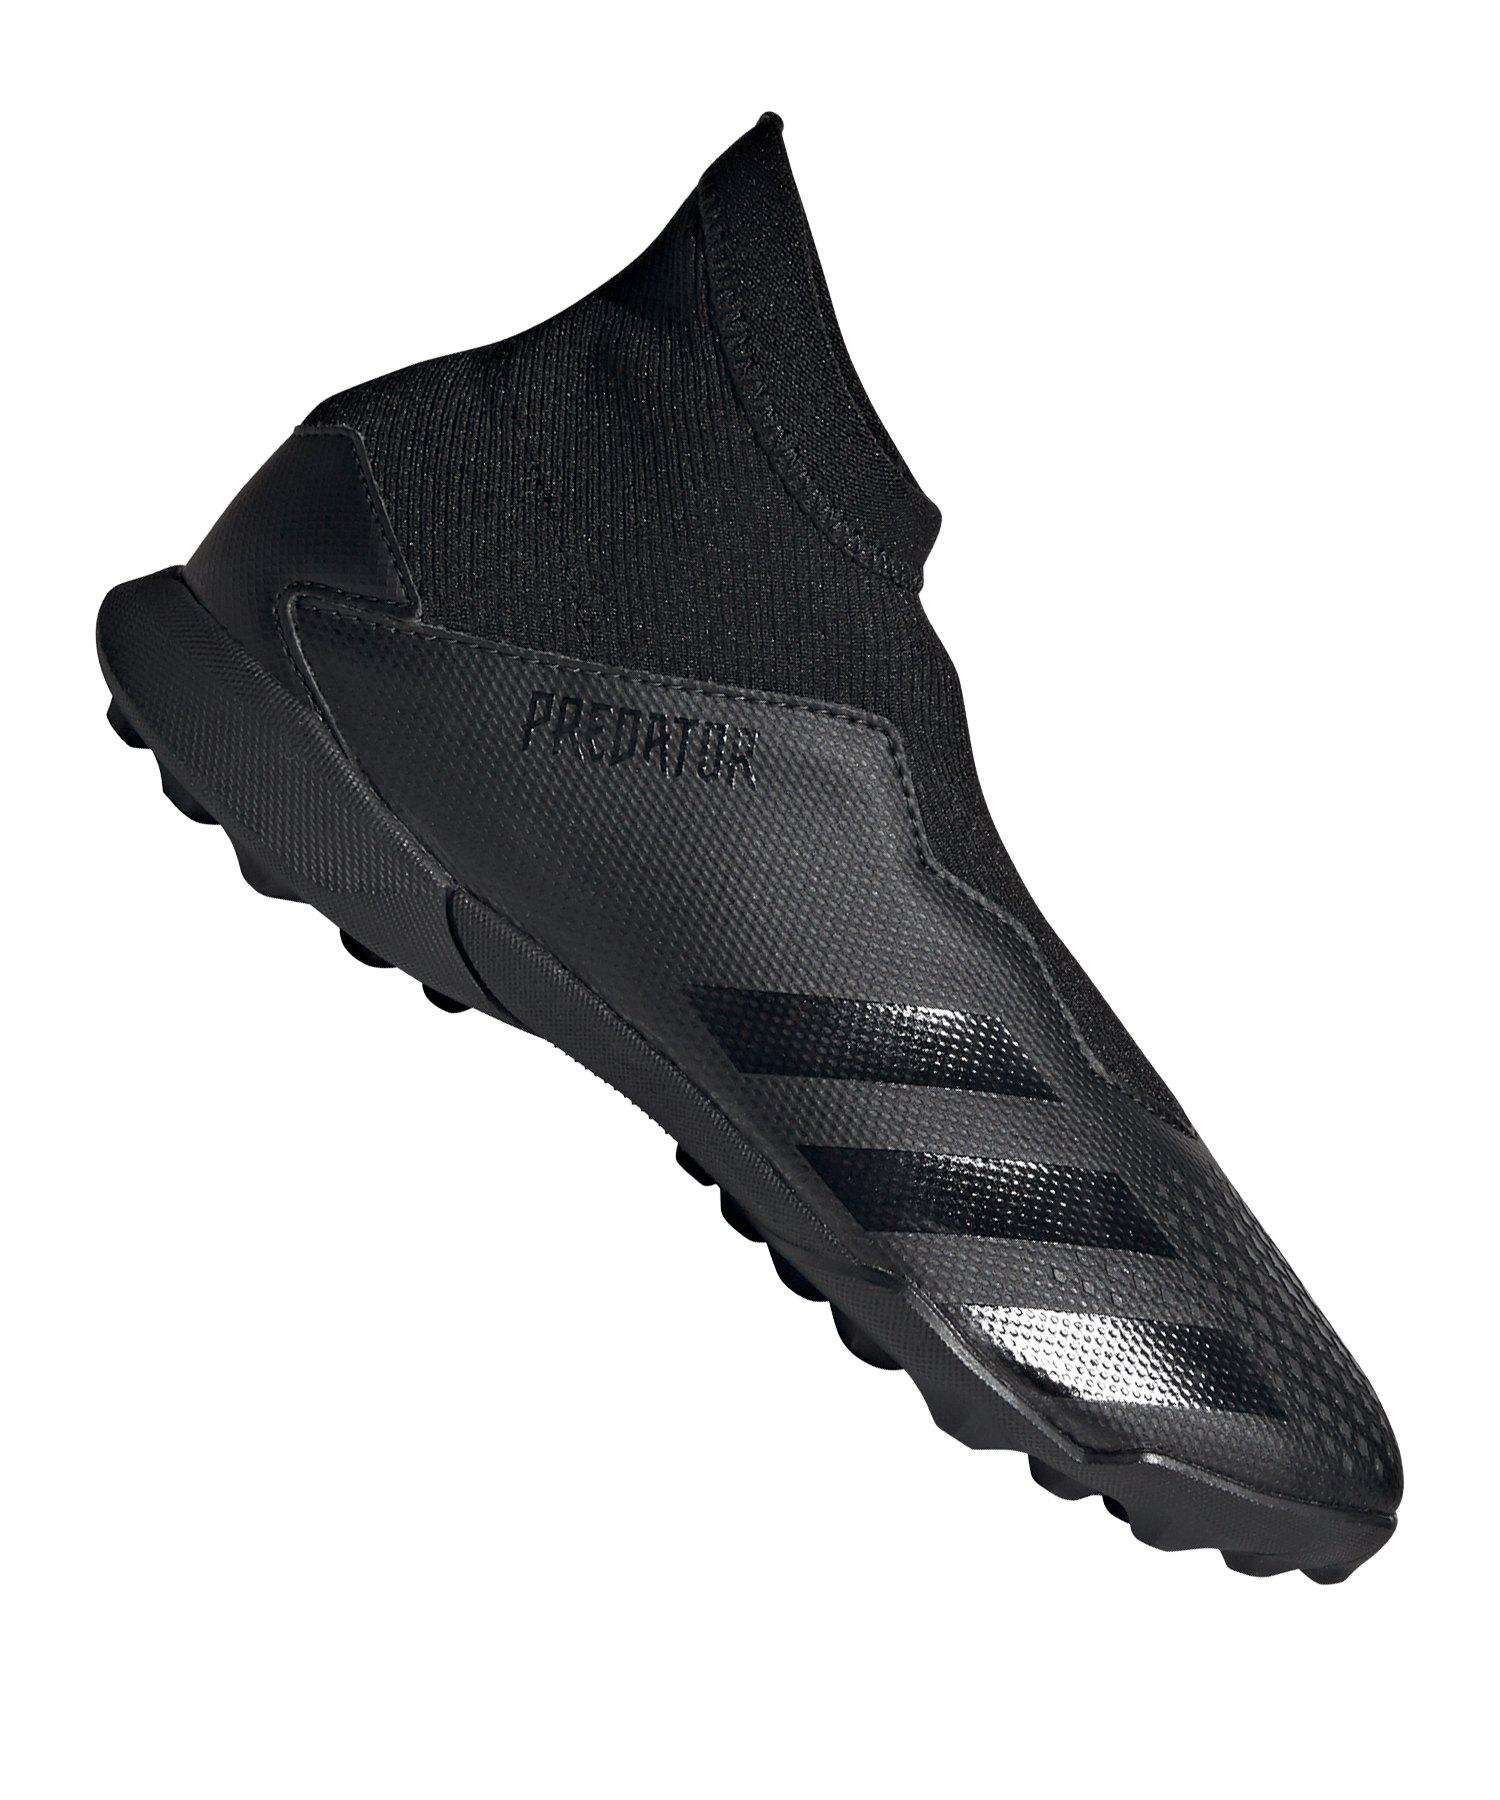 adidas Predator 20.3 LL TF Kids Schwarz - schwarz